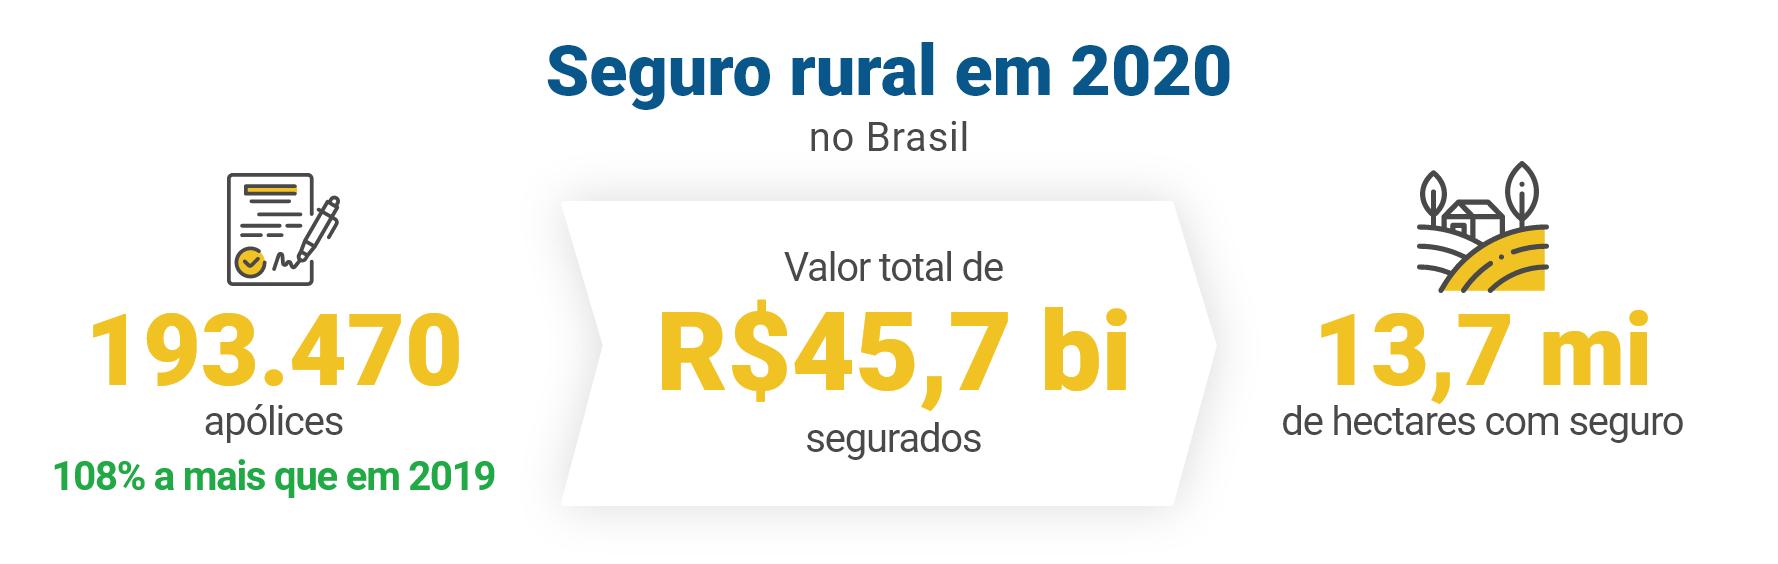 Seguro rural em 2020